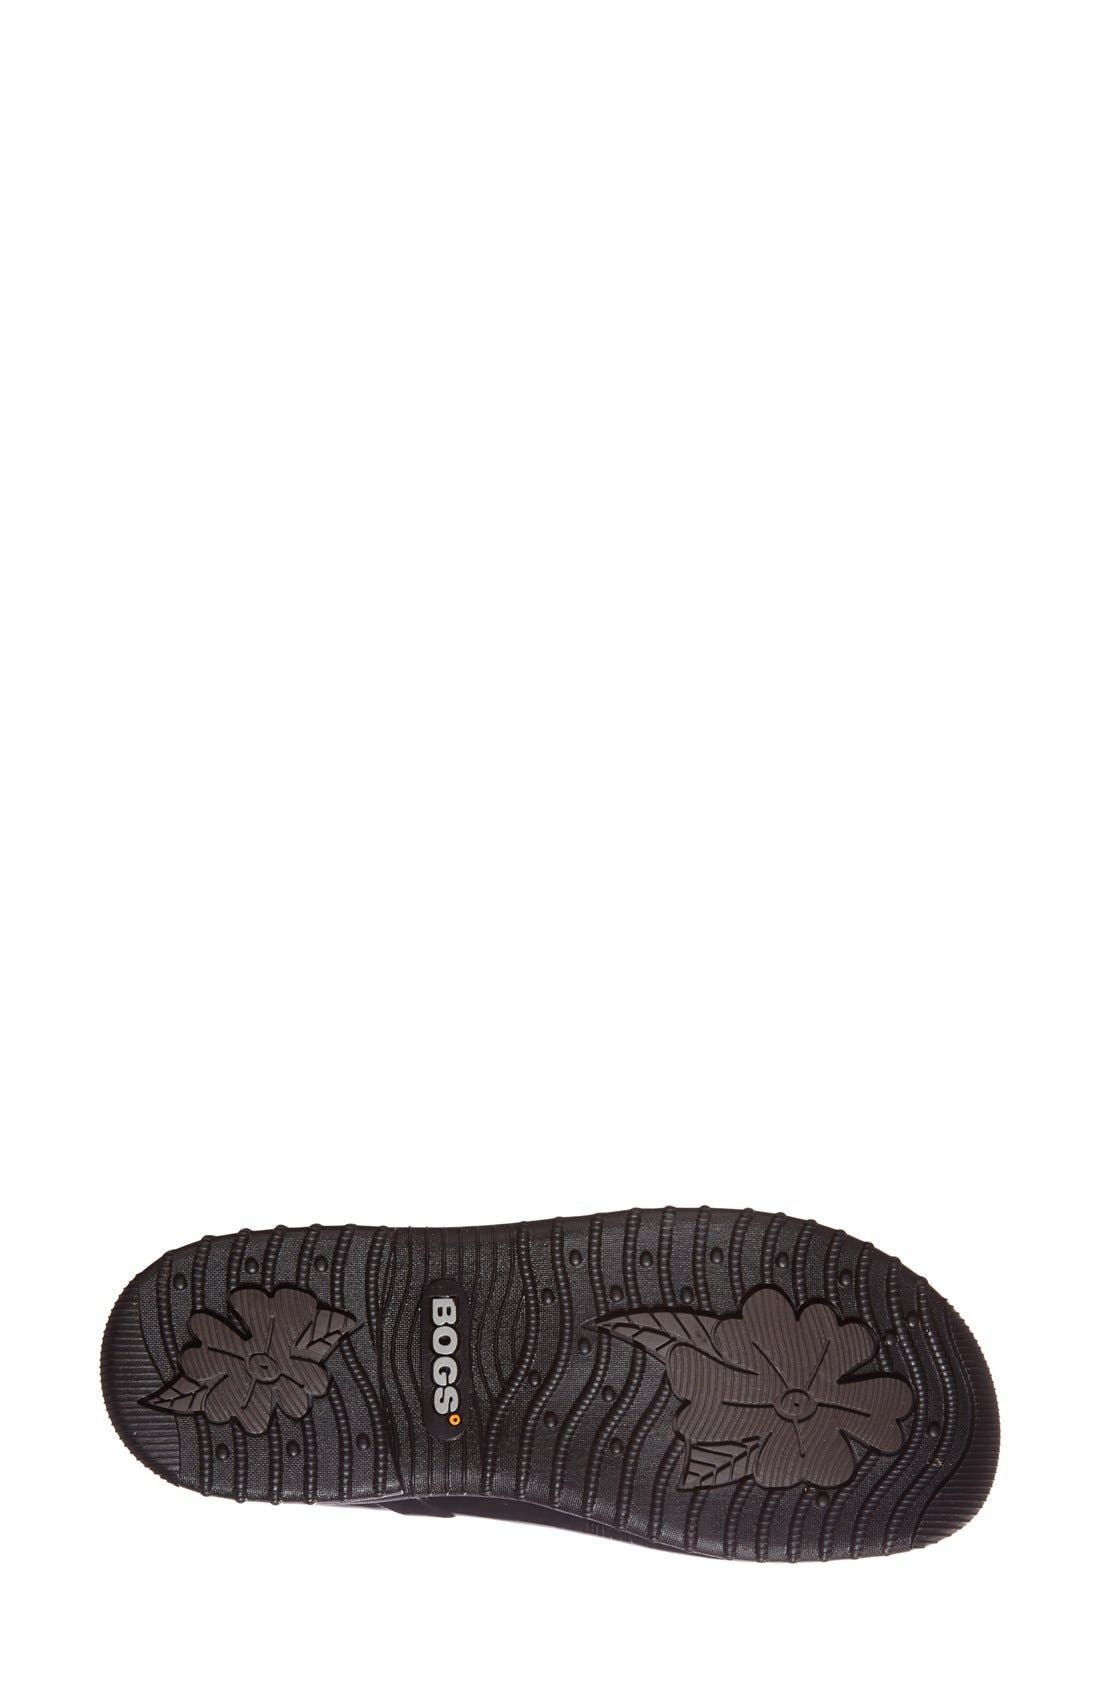 'Seattle' Waterproof Short Boot,                             Alternate thumbnail 4, color,                             BLACK